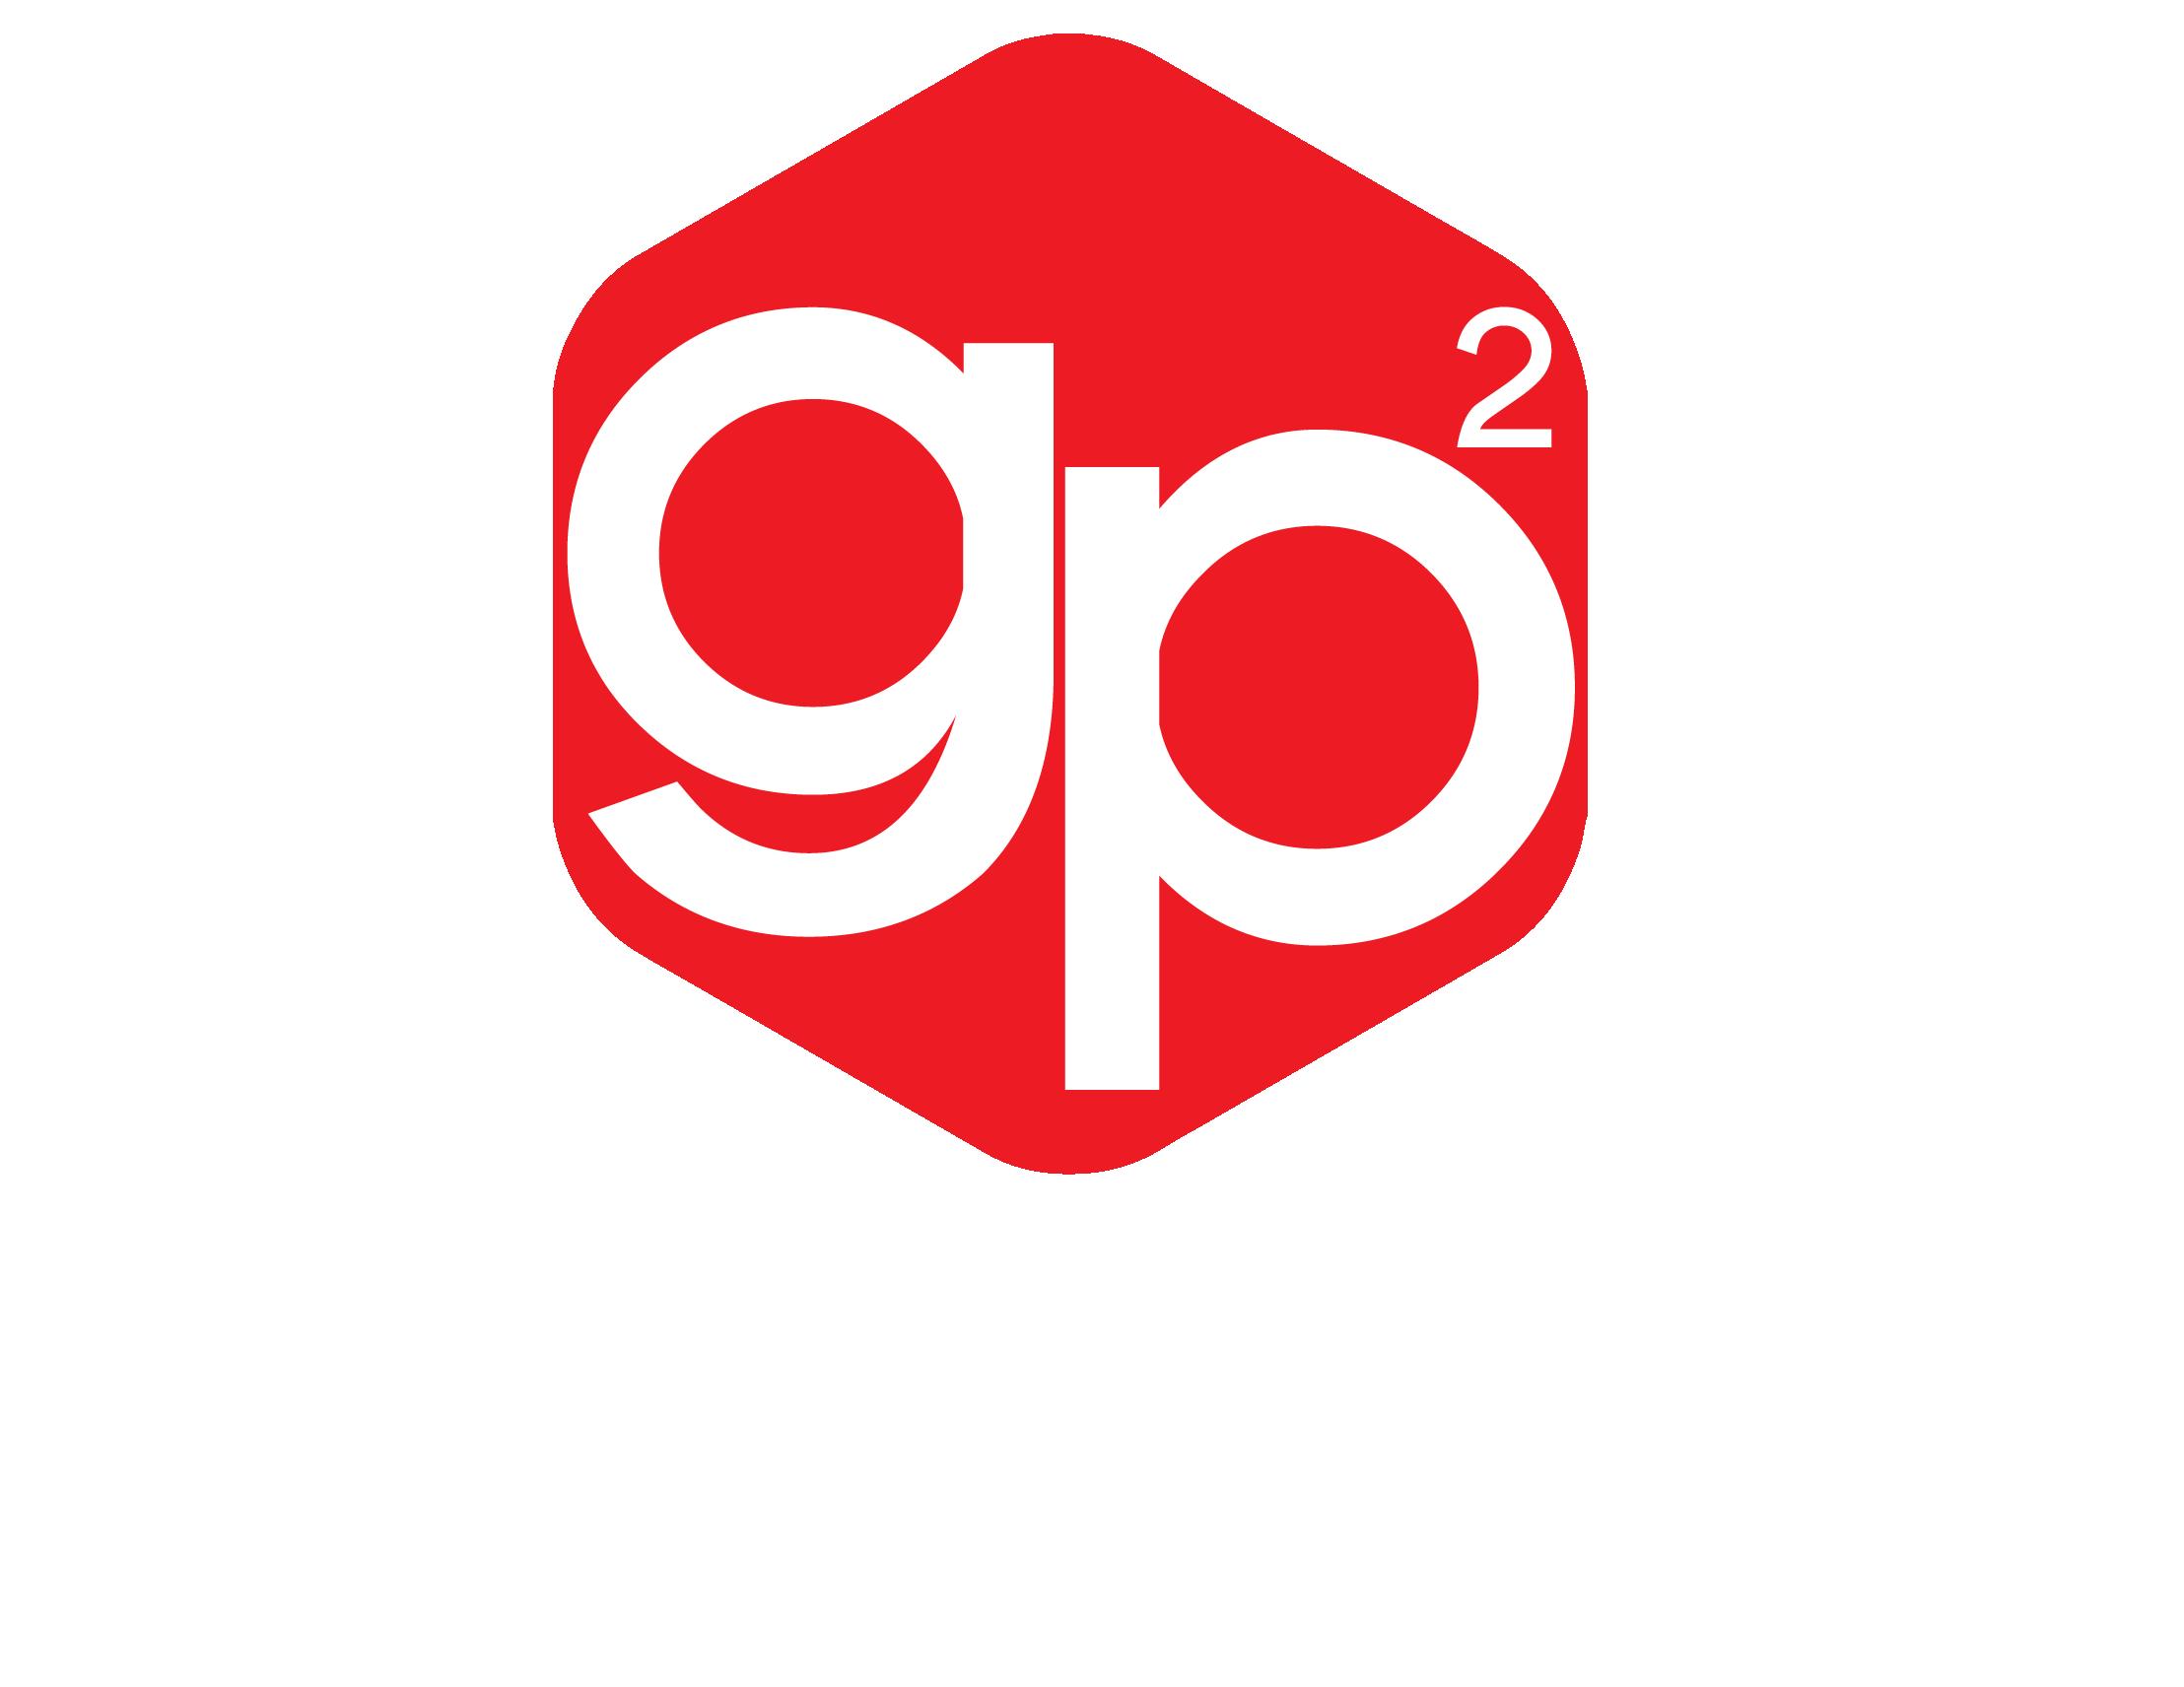 ghamaypepito